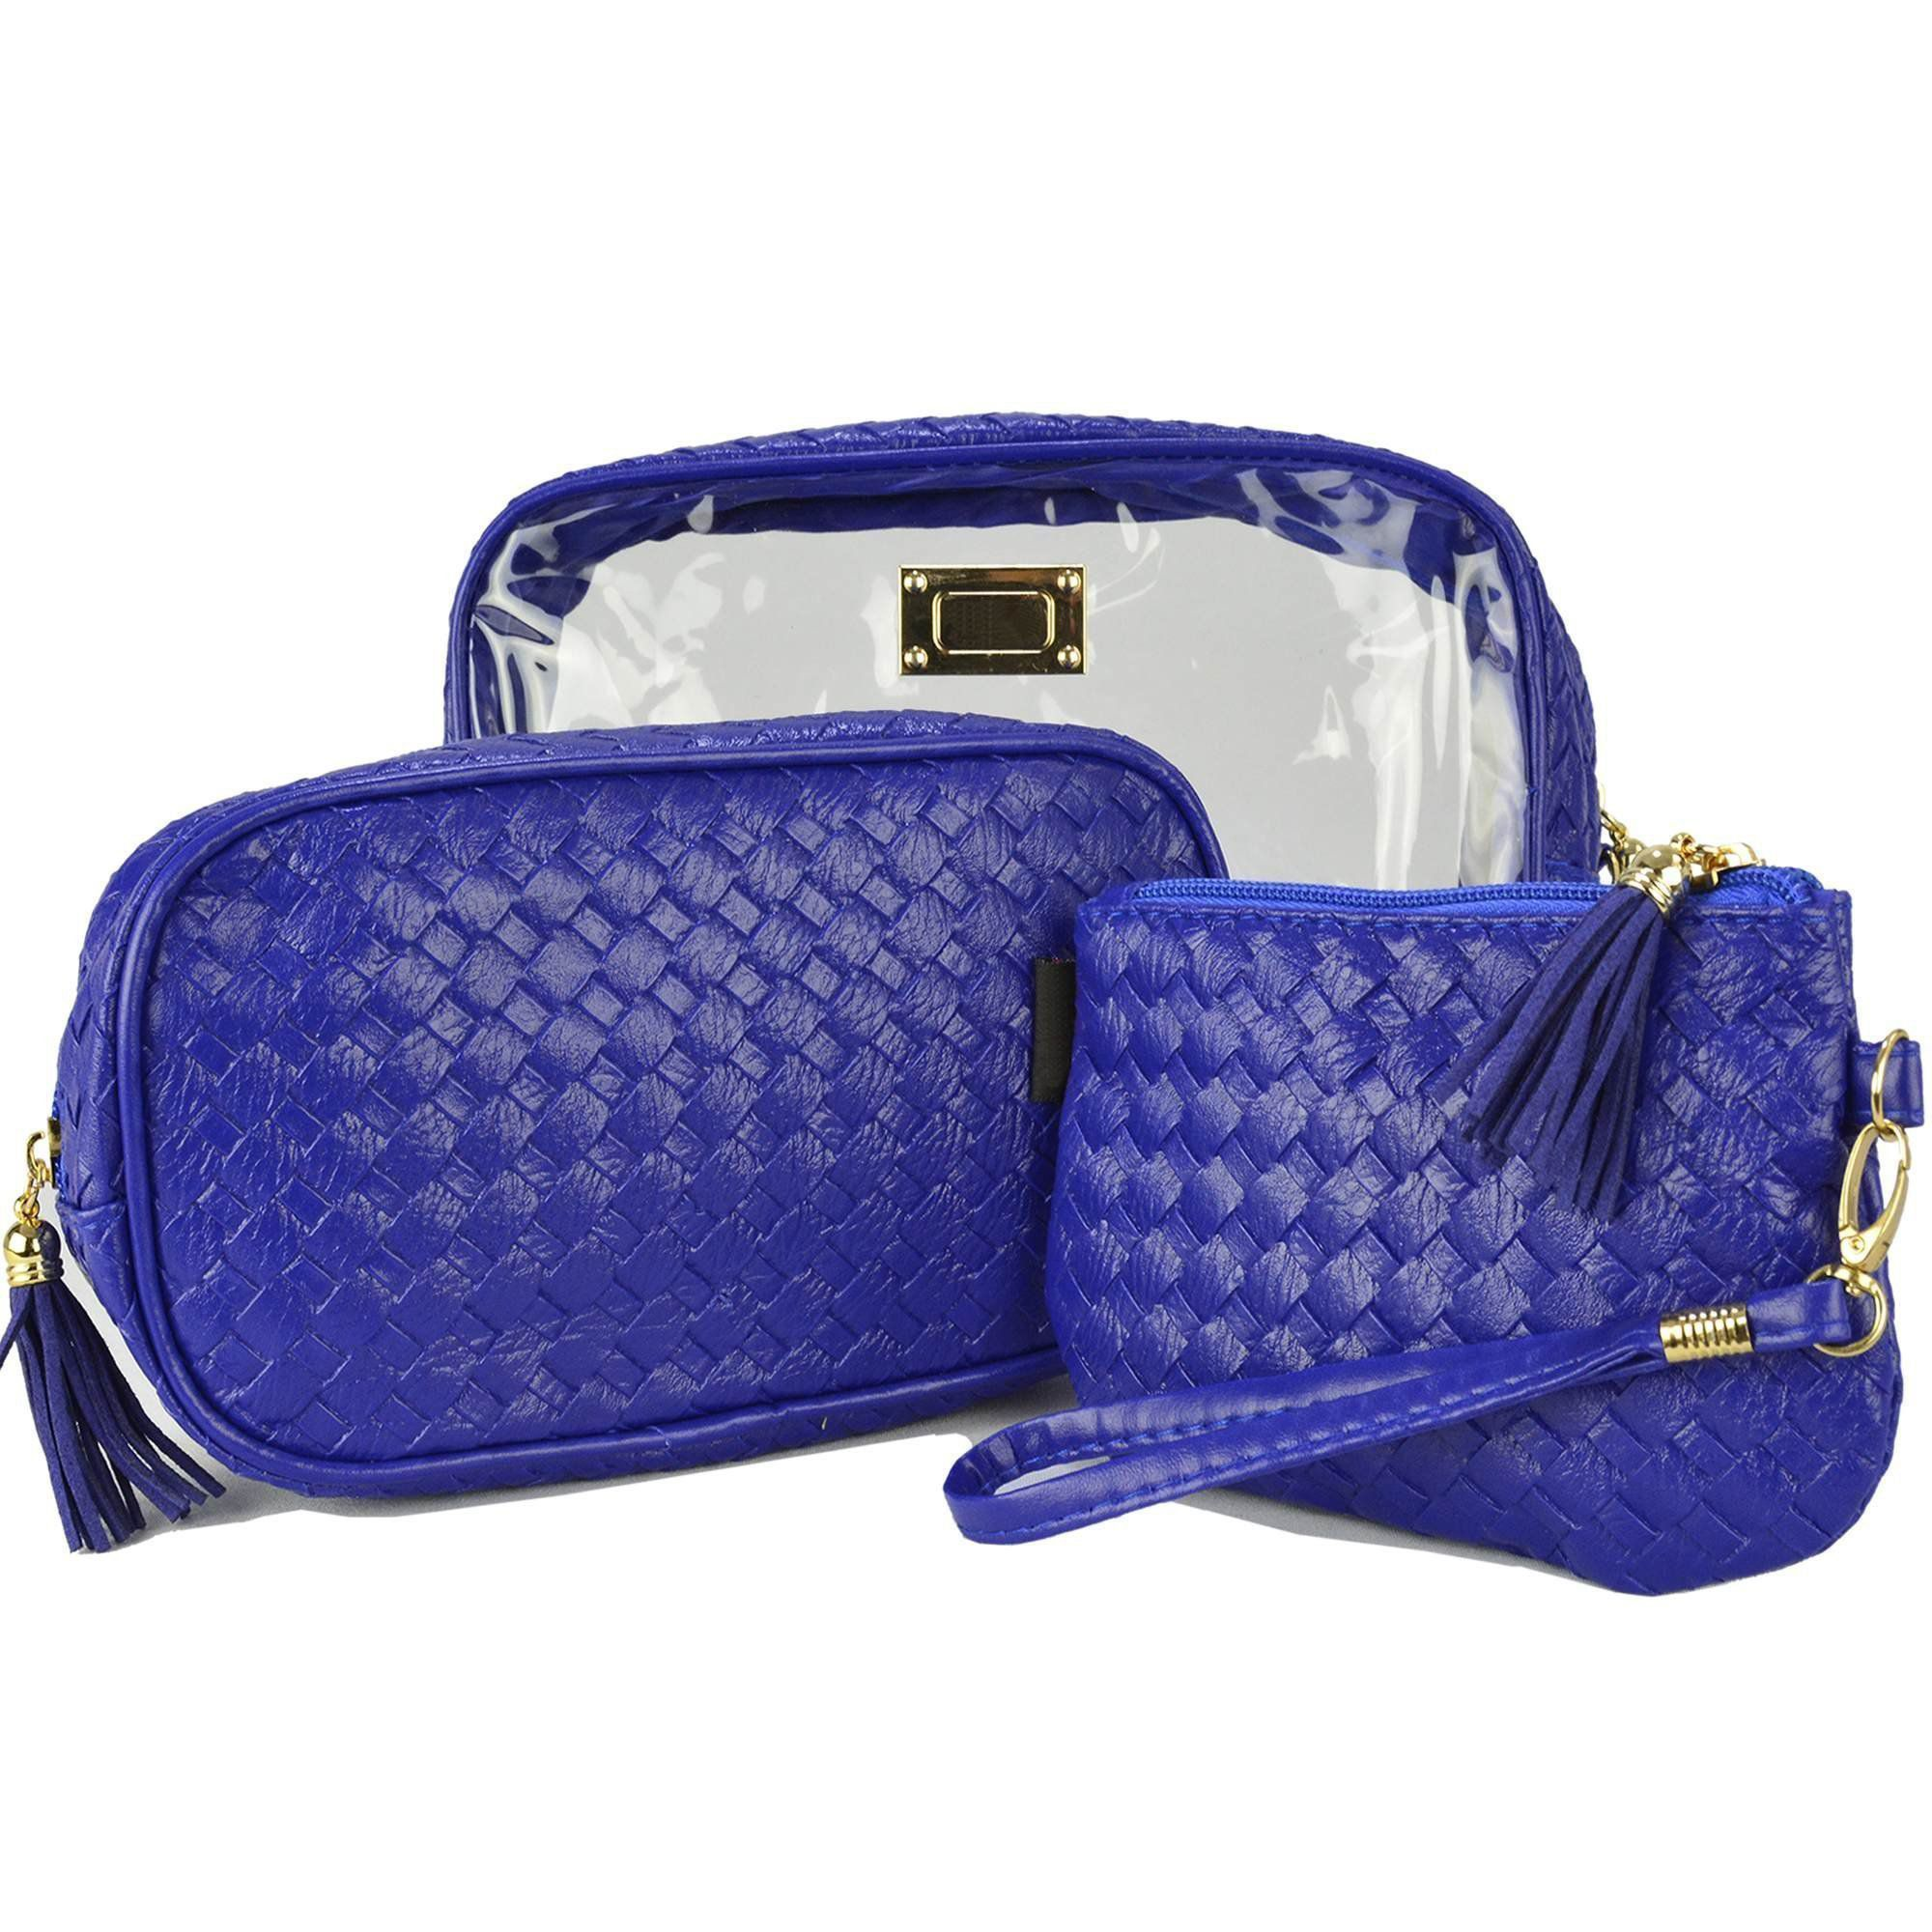 Frasqueiras Nécessaire Feminina Luxo Azul Kit 3 Peças CBRN08254